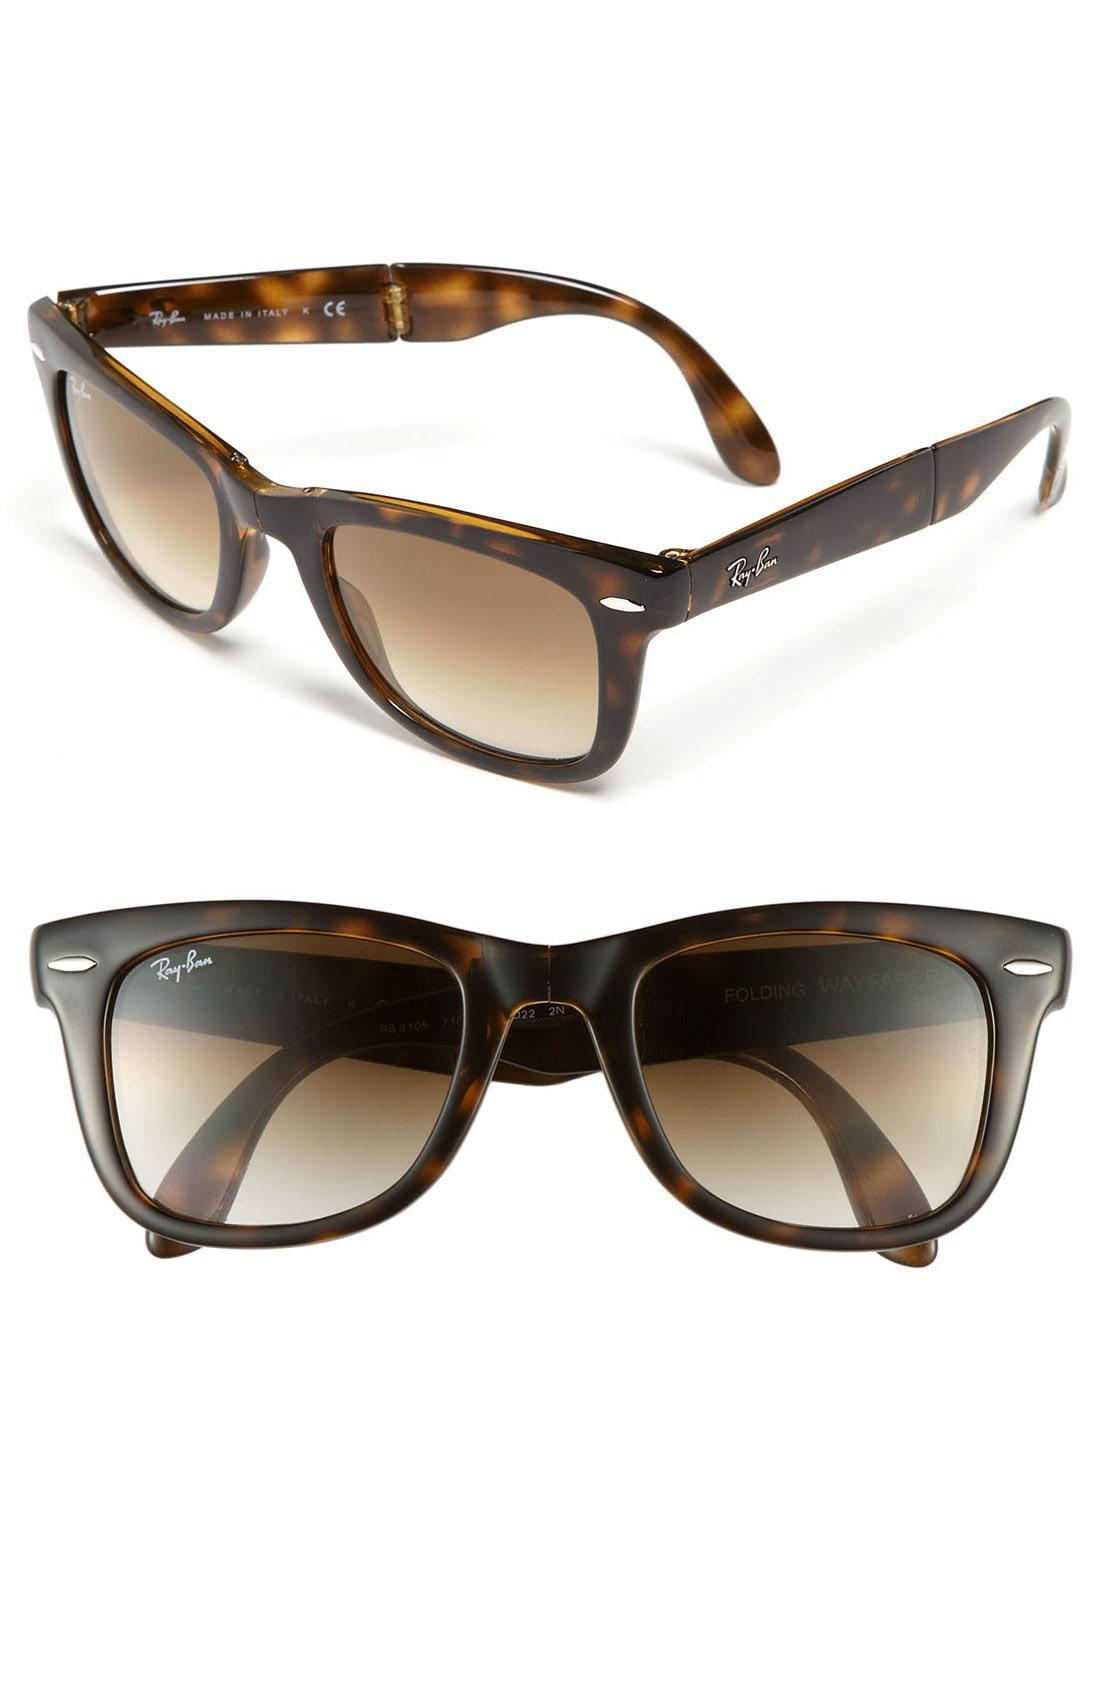 a04afae1ecb Lyst - Ray-Ban Standard 50mm Folding Wayfarer Sunglasses - Light ...